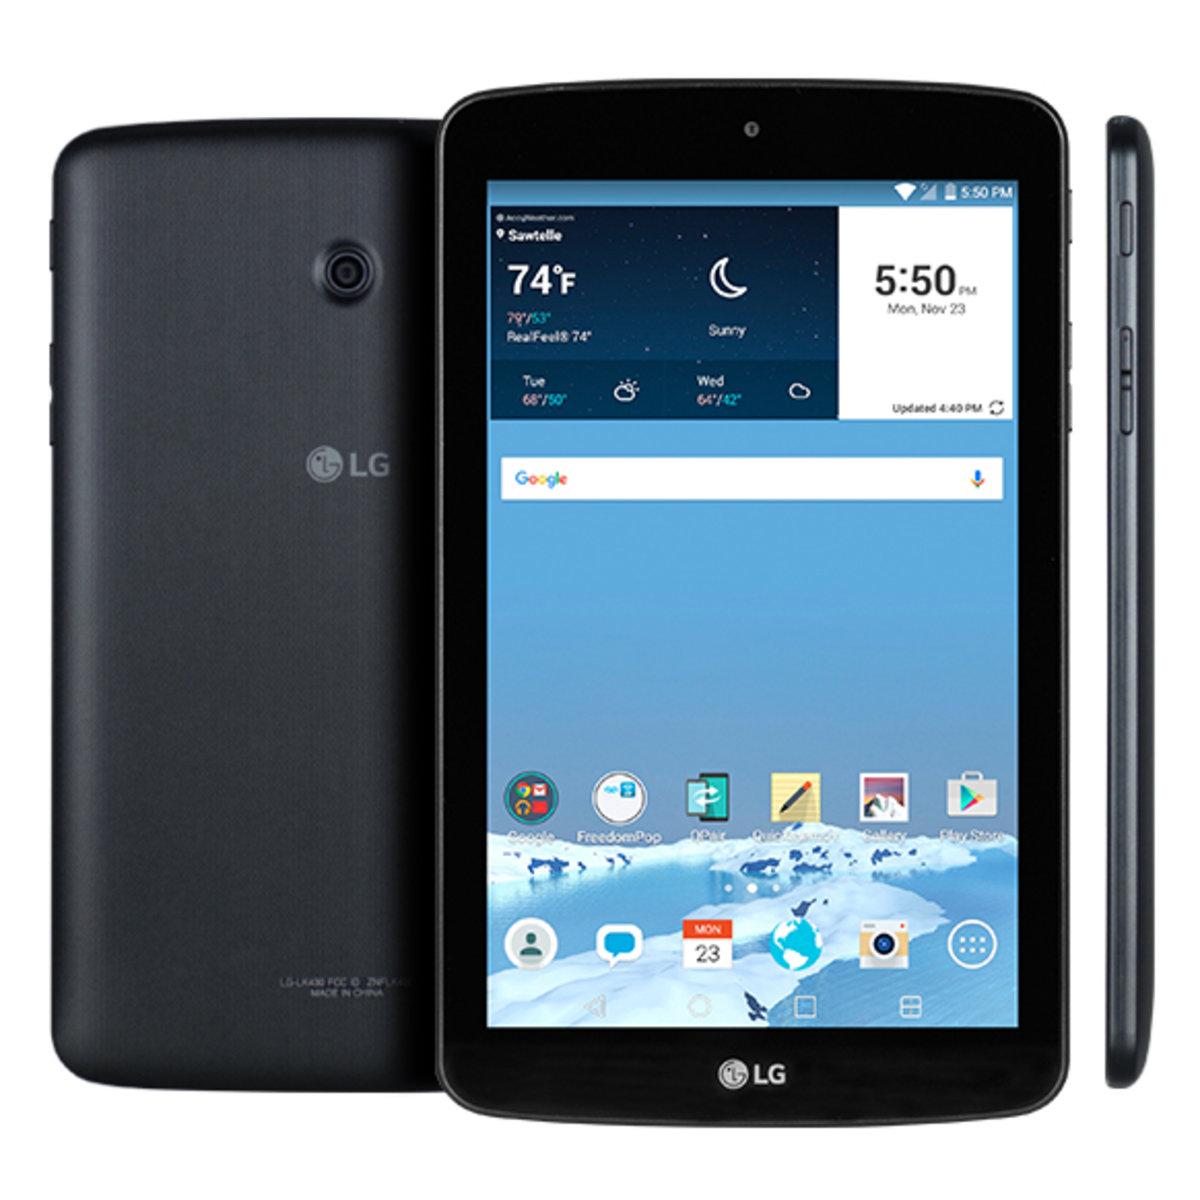 "7"" LG G Pad 8GB Tablet (WiFi + LTE) + Free Internet w/FreedomPop (Refurbished) - $49.99 + Free Shipping"